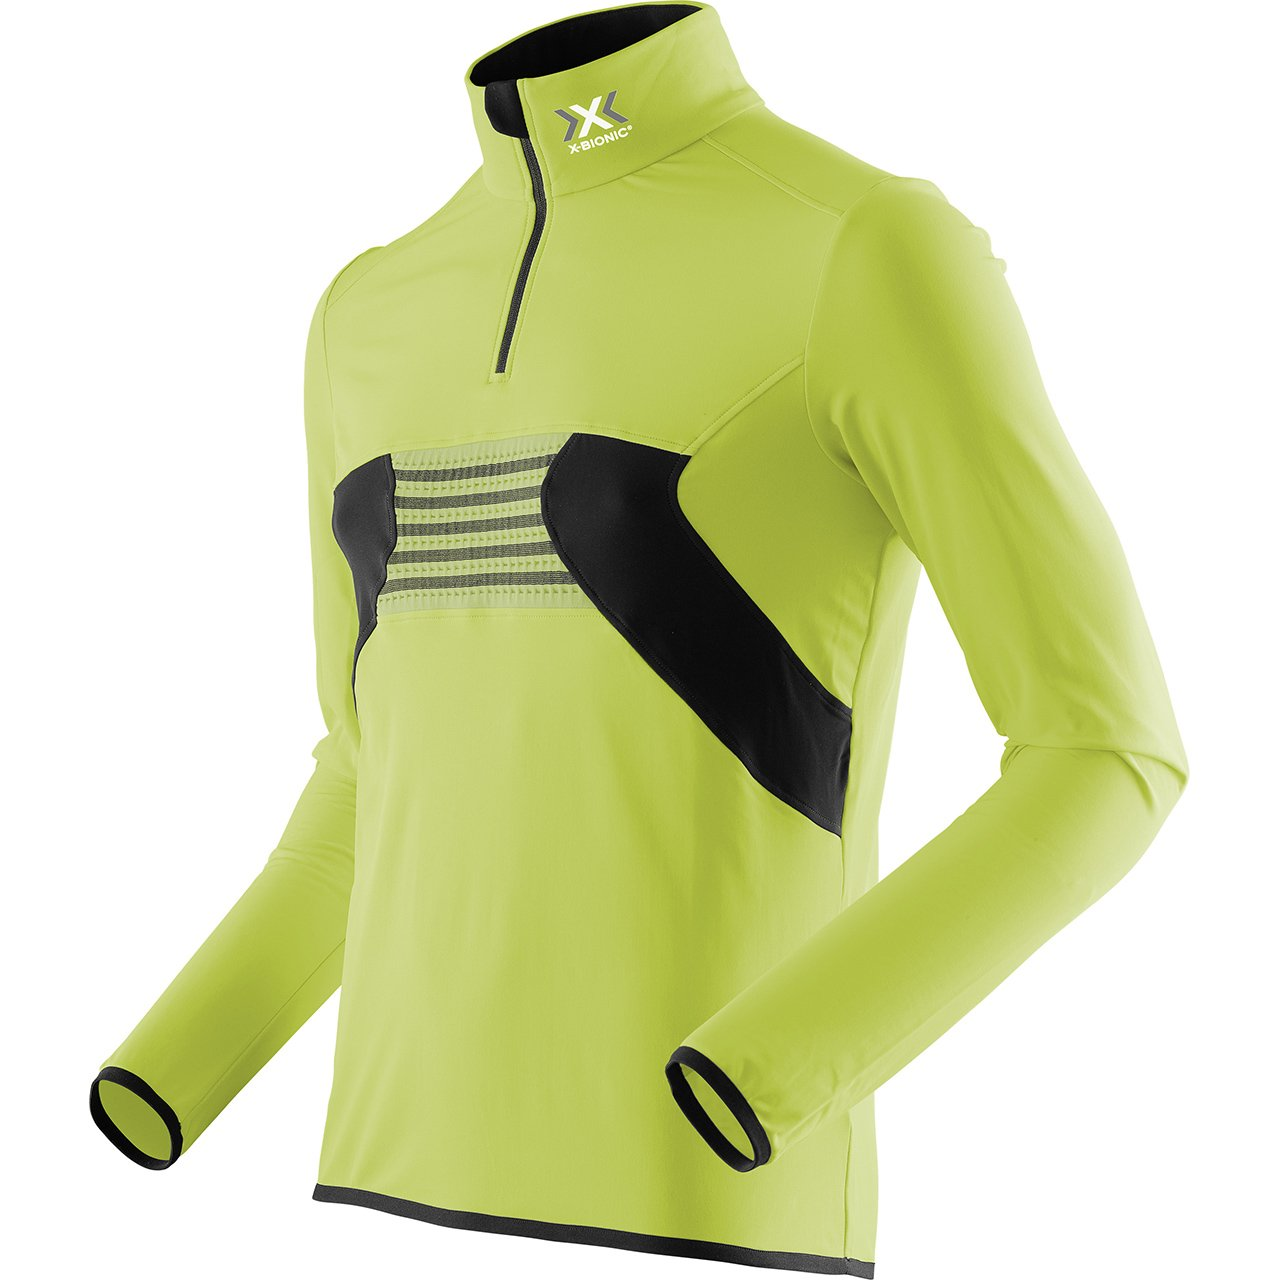 X-Bionic Mapache Camiseta/Jacket Lime XL: Amazon.es: Deportes y ...